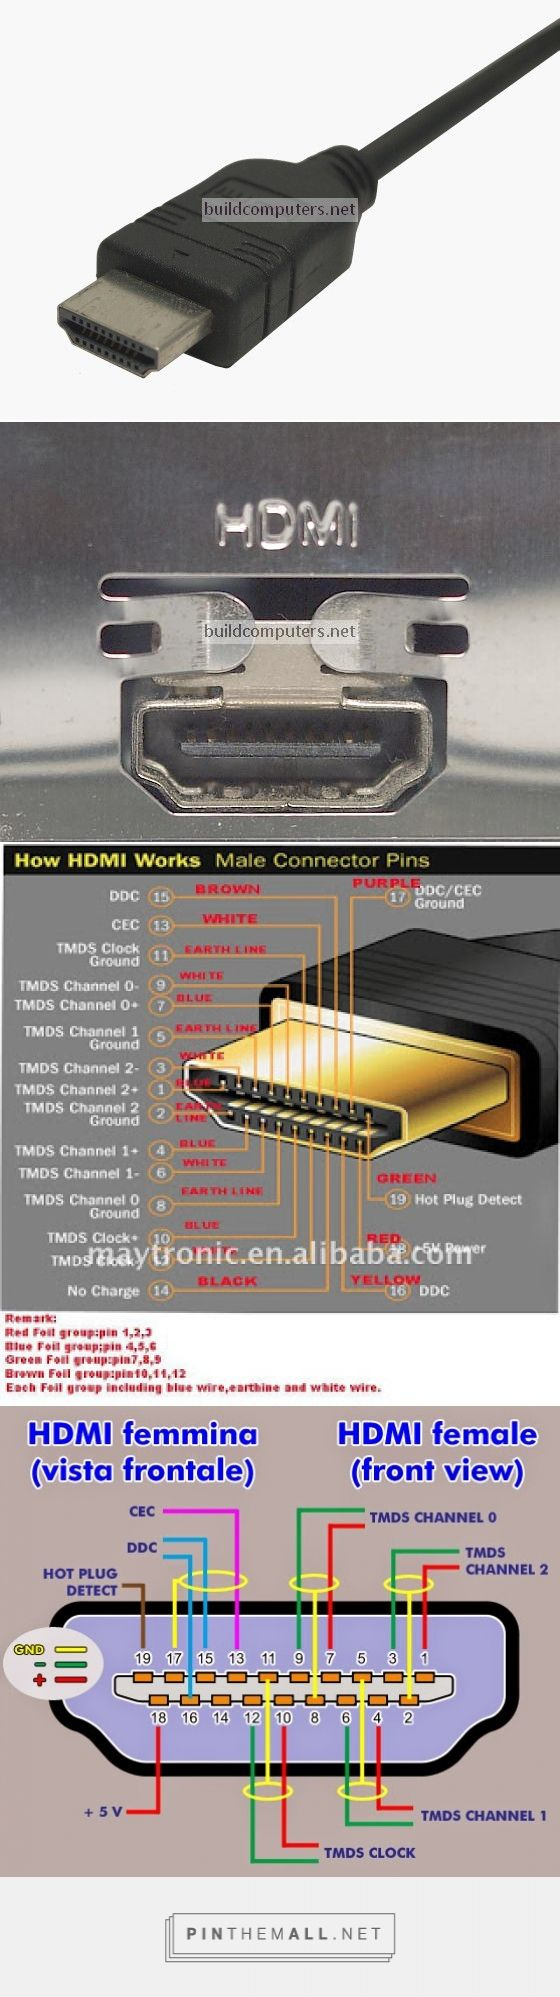 HDMI cable, port, & pinouts